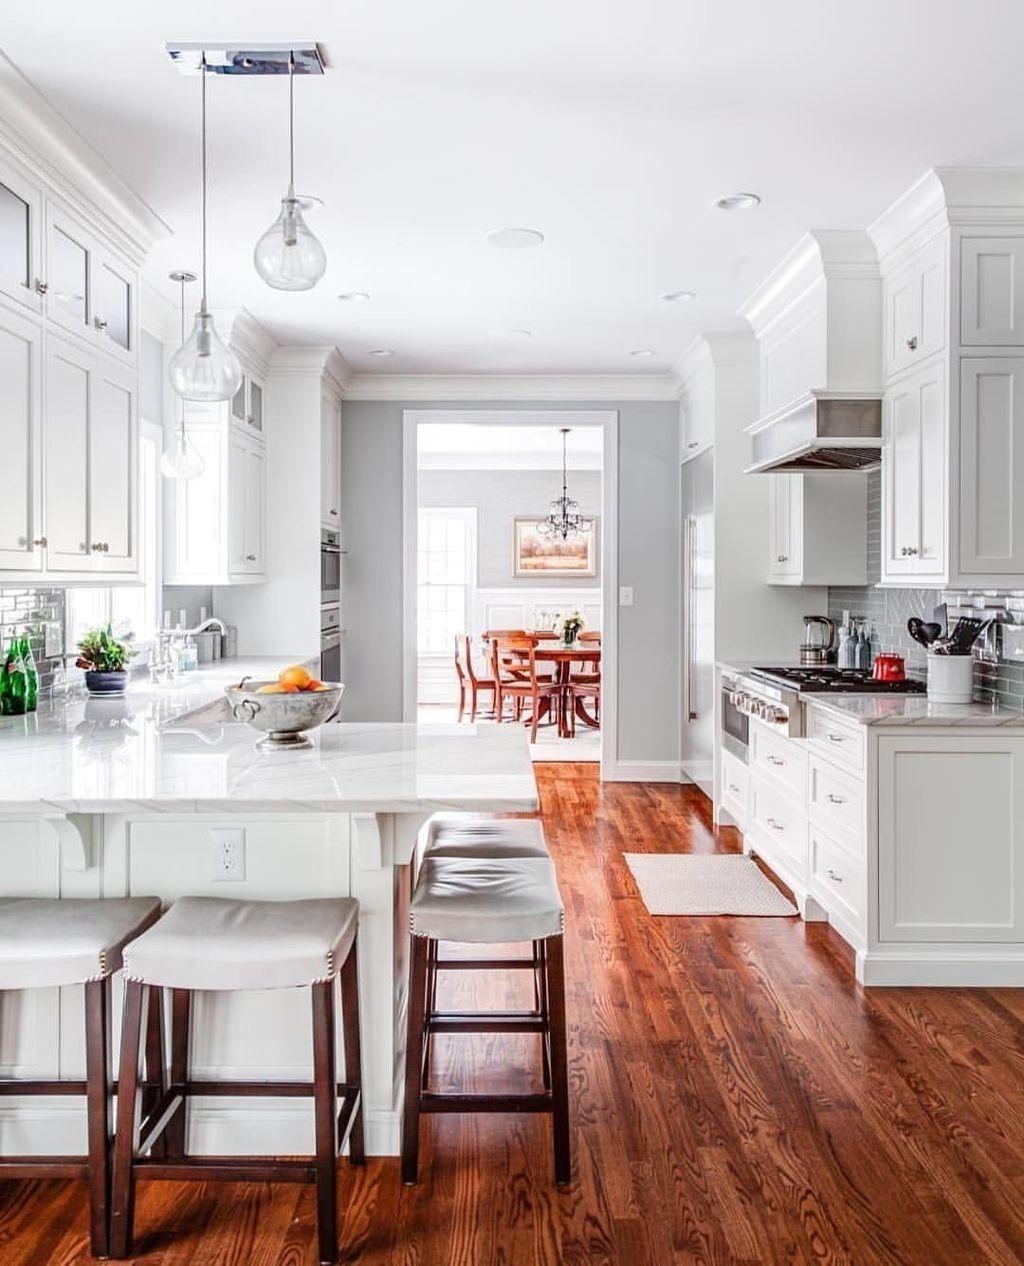 44 Stylish White Kitchen Design Ideas For Your Home - HOMEWOWDECOR